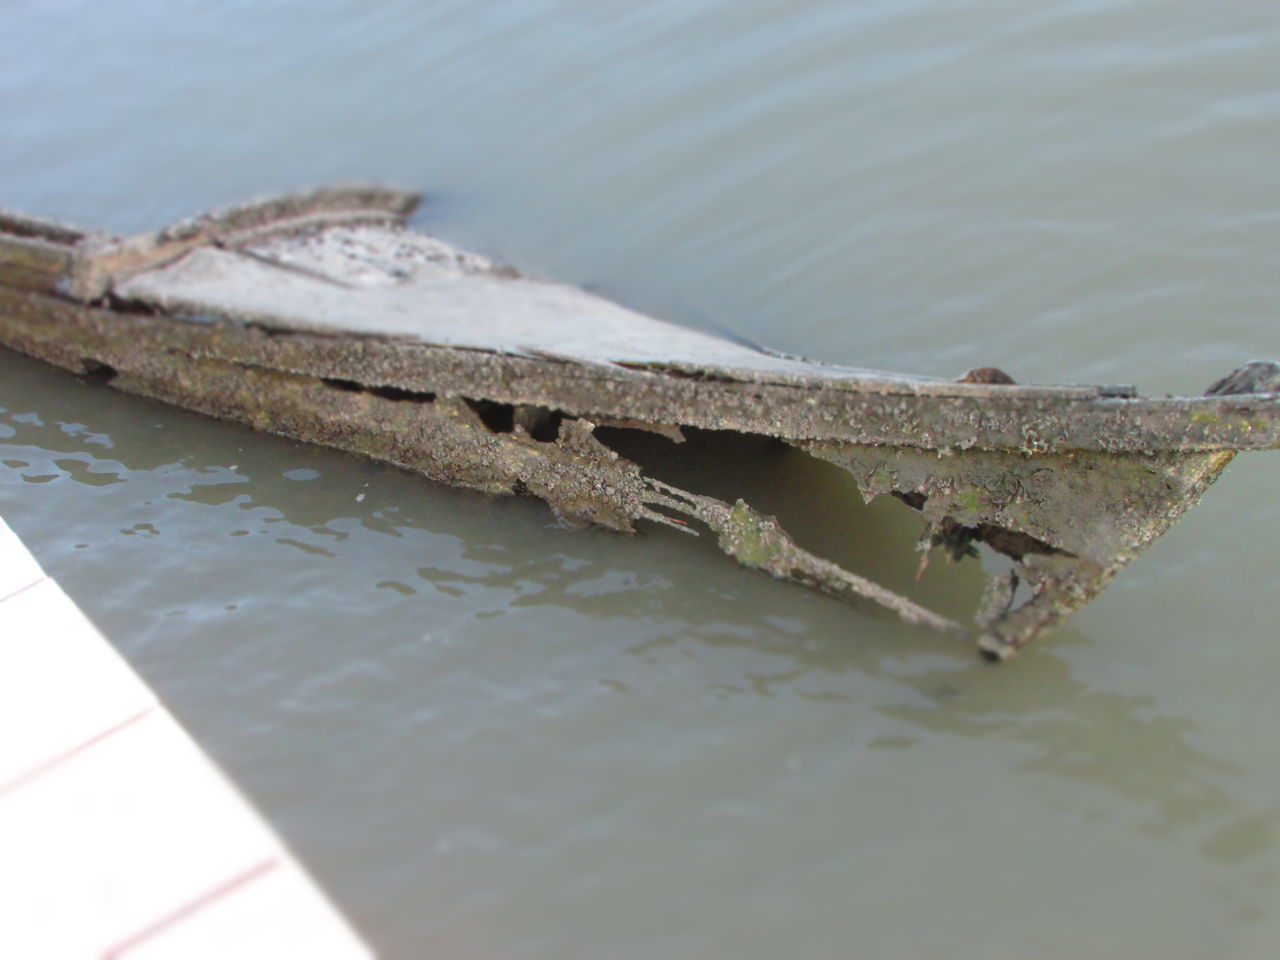 Check This Out EyeEm Best Shots EyeEm Gallery EyeEmBestPics Old Boat Wrecked